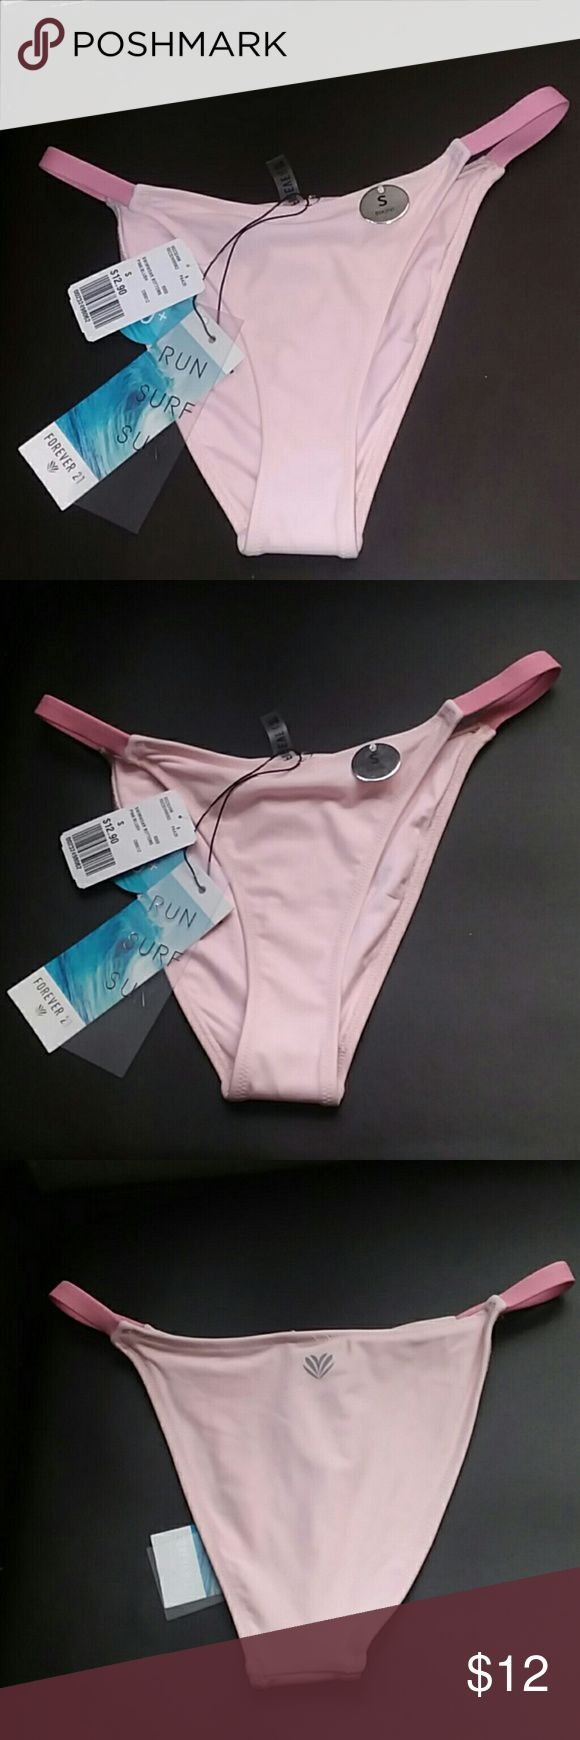 Pink Bikini Bottom 💓 Run,Surf,Swim pink bikini bottom Forever 21 Swim Bikinis